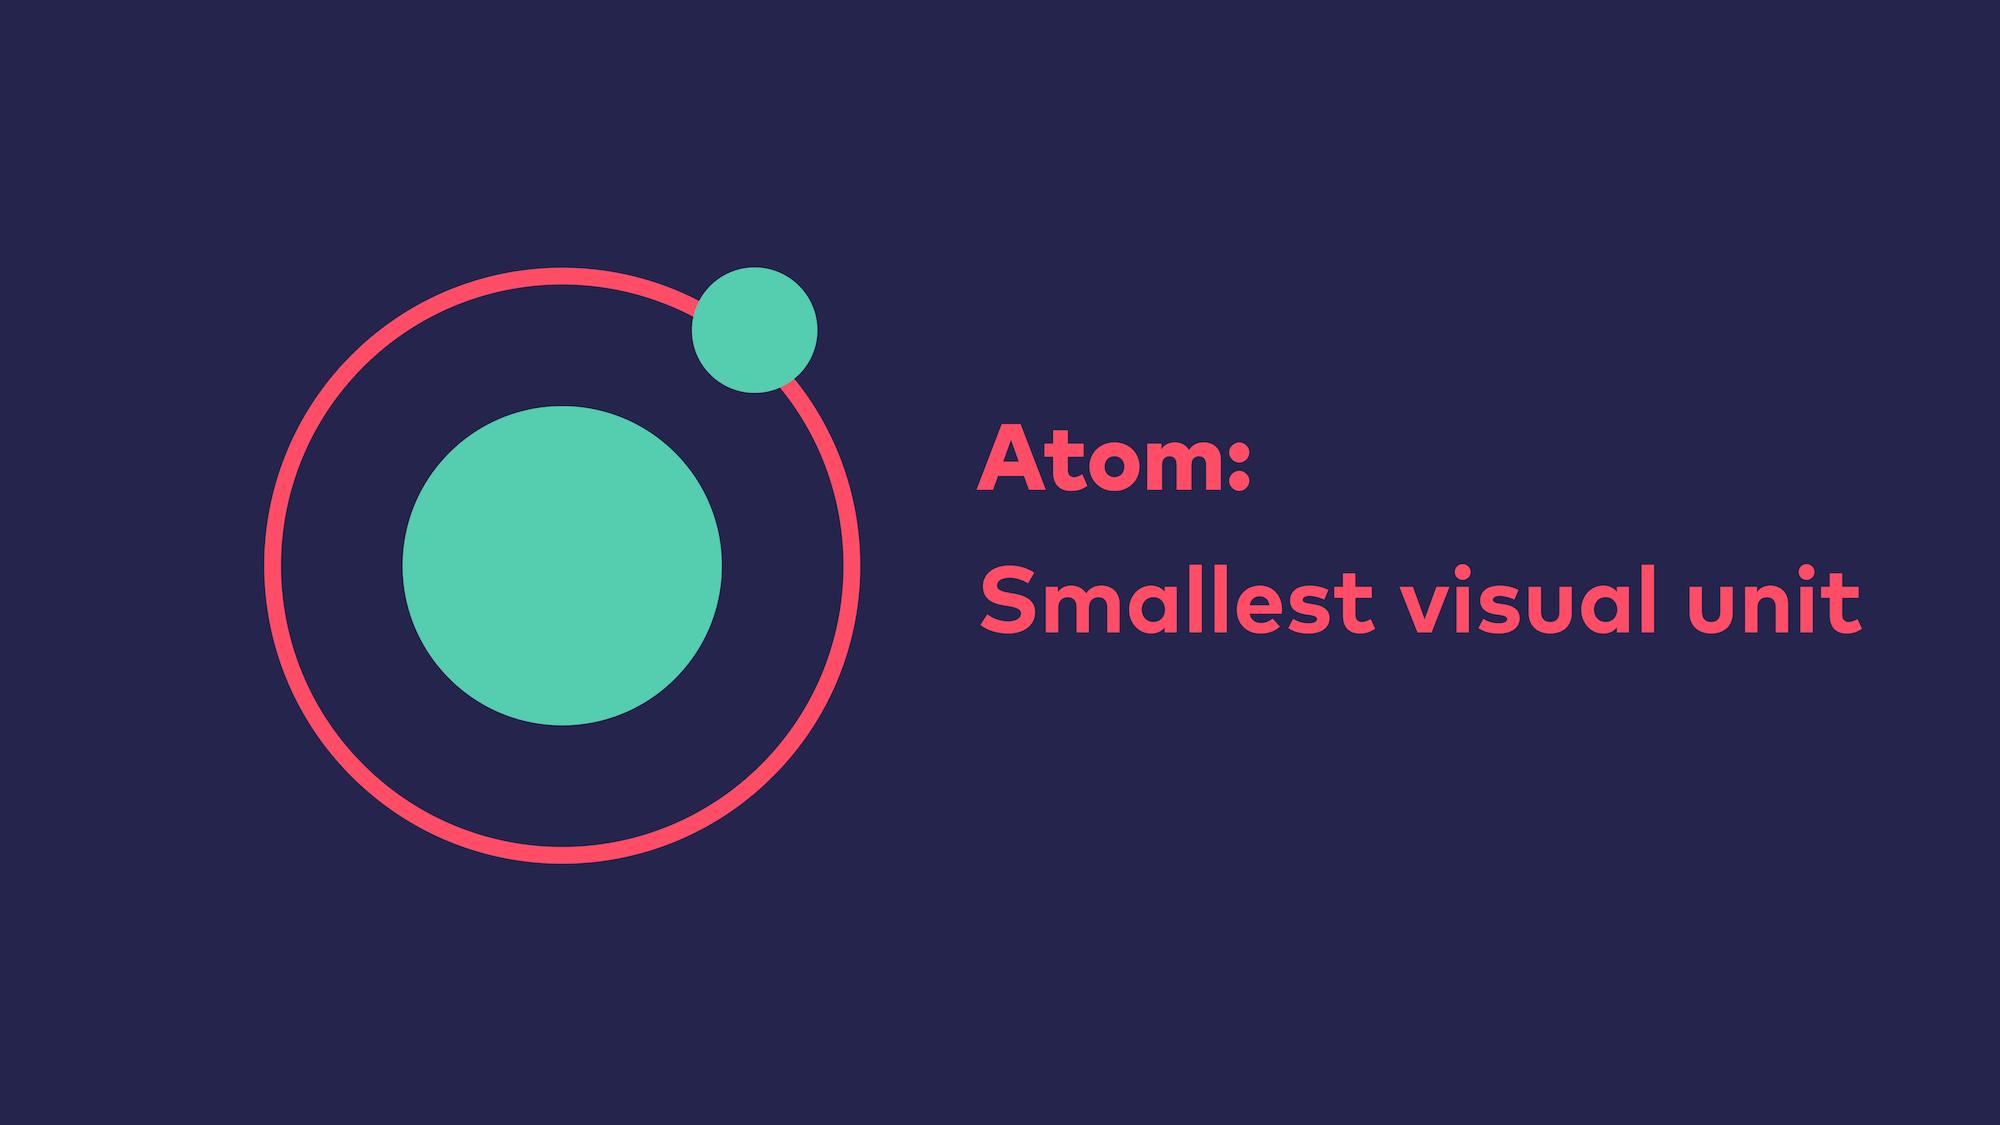 Abb. 5: Atomic Design - Atom